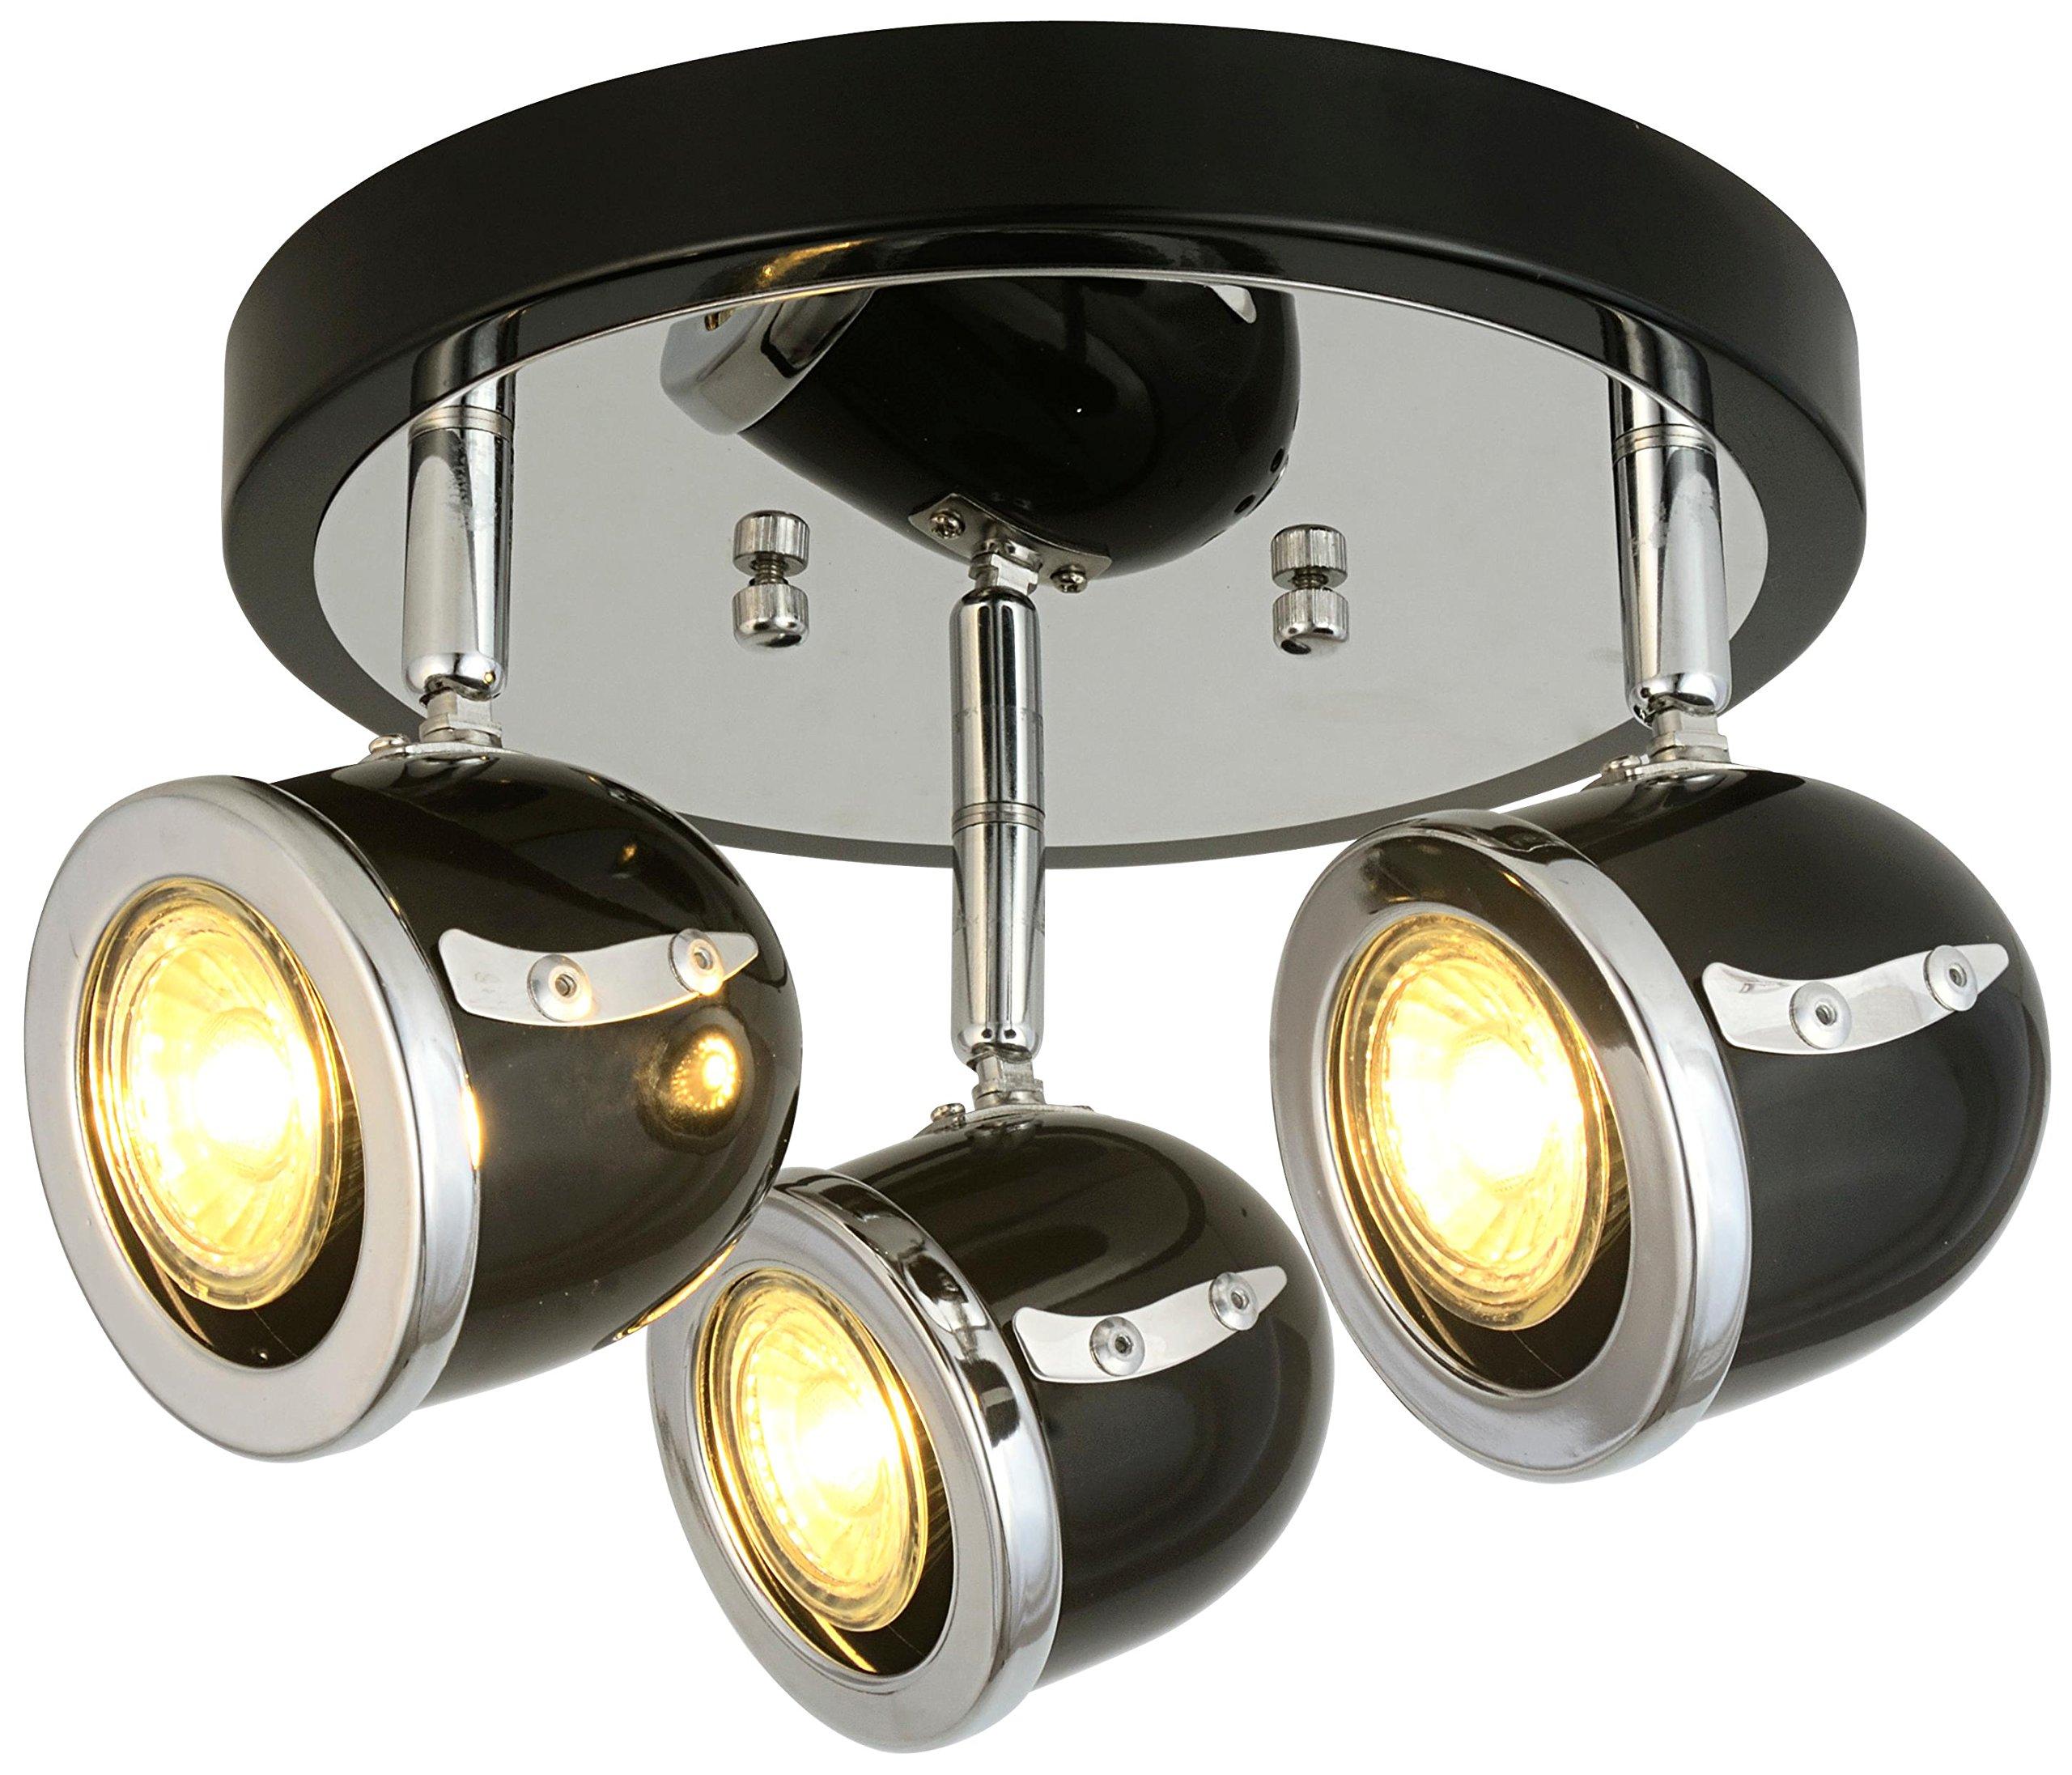 LED Retro Adjustable Eyeball Black &Chrome Ceiling Spotlight (Black & Chrome, 3 Lights Ceiling)